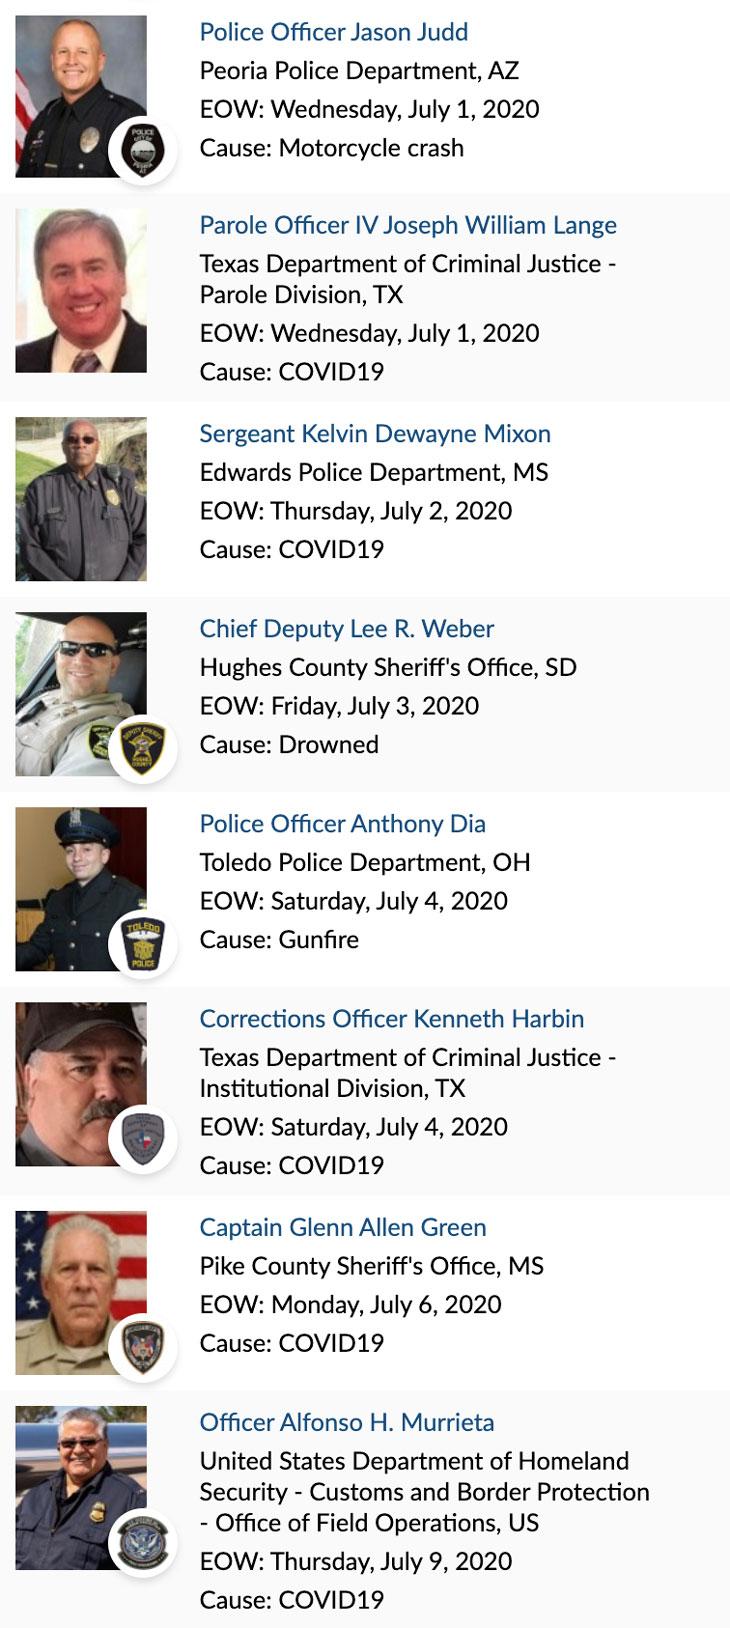 Officer Memorial 07-2020 1 of 3